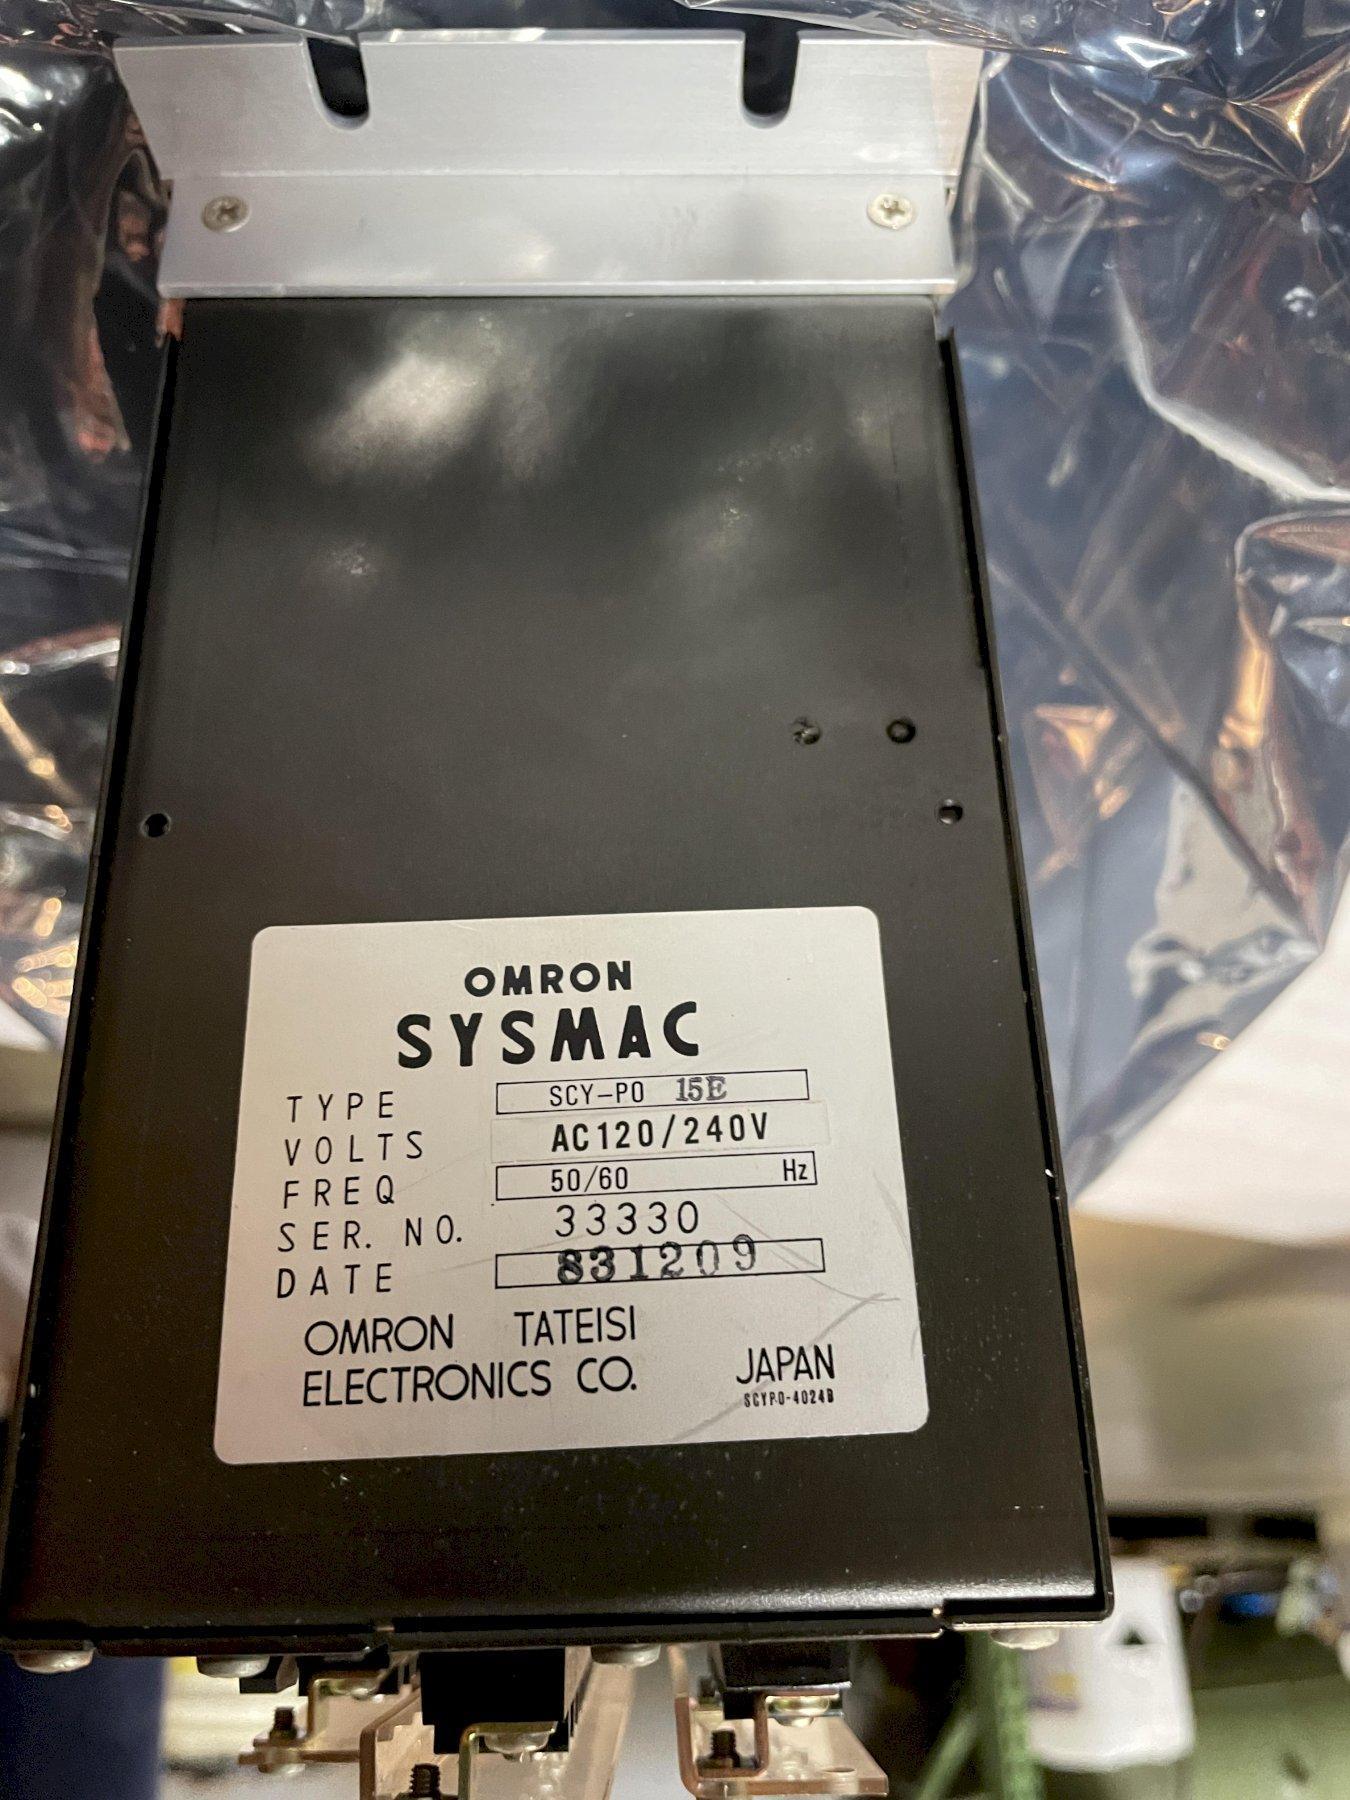 OMRON TATEISI ELECTRONICS CO SYSMAC Sequence Controller, Model SCY-P0 15E.